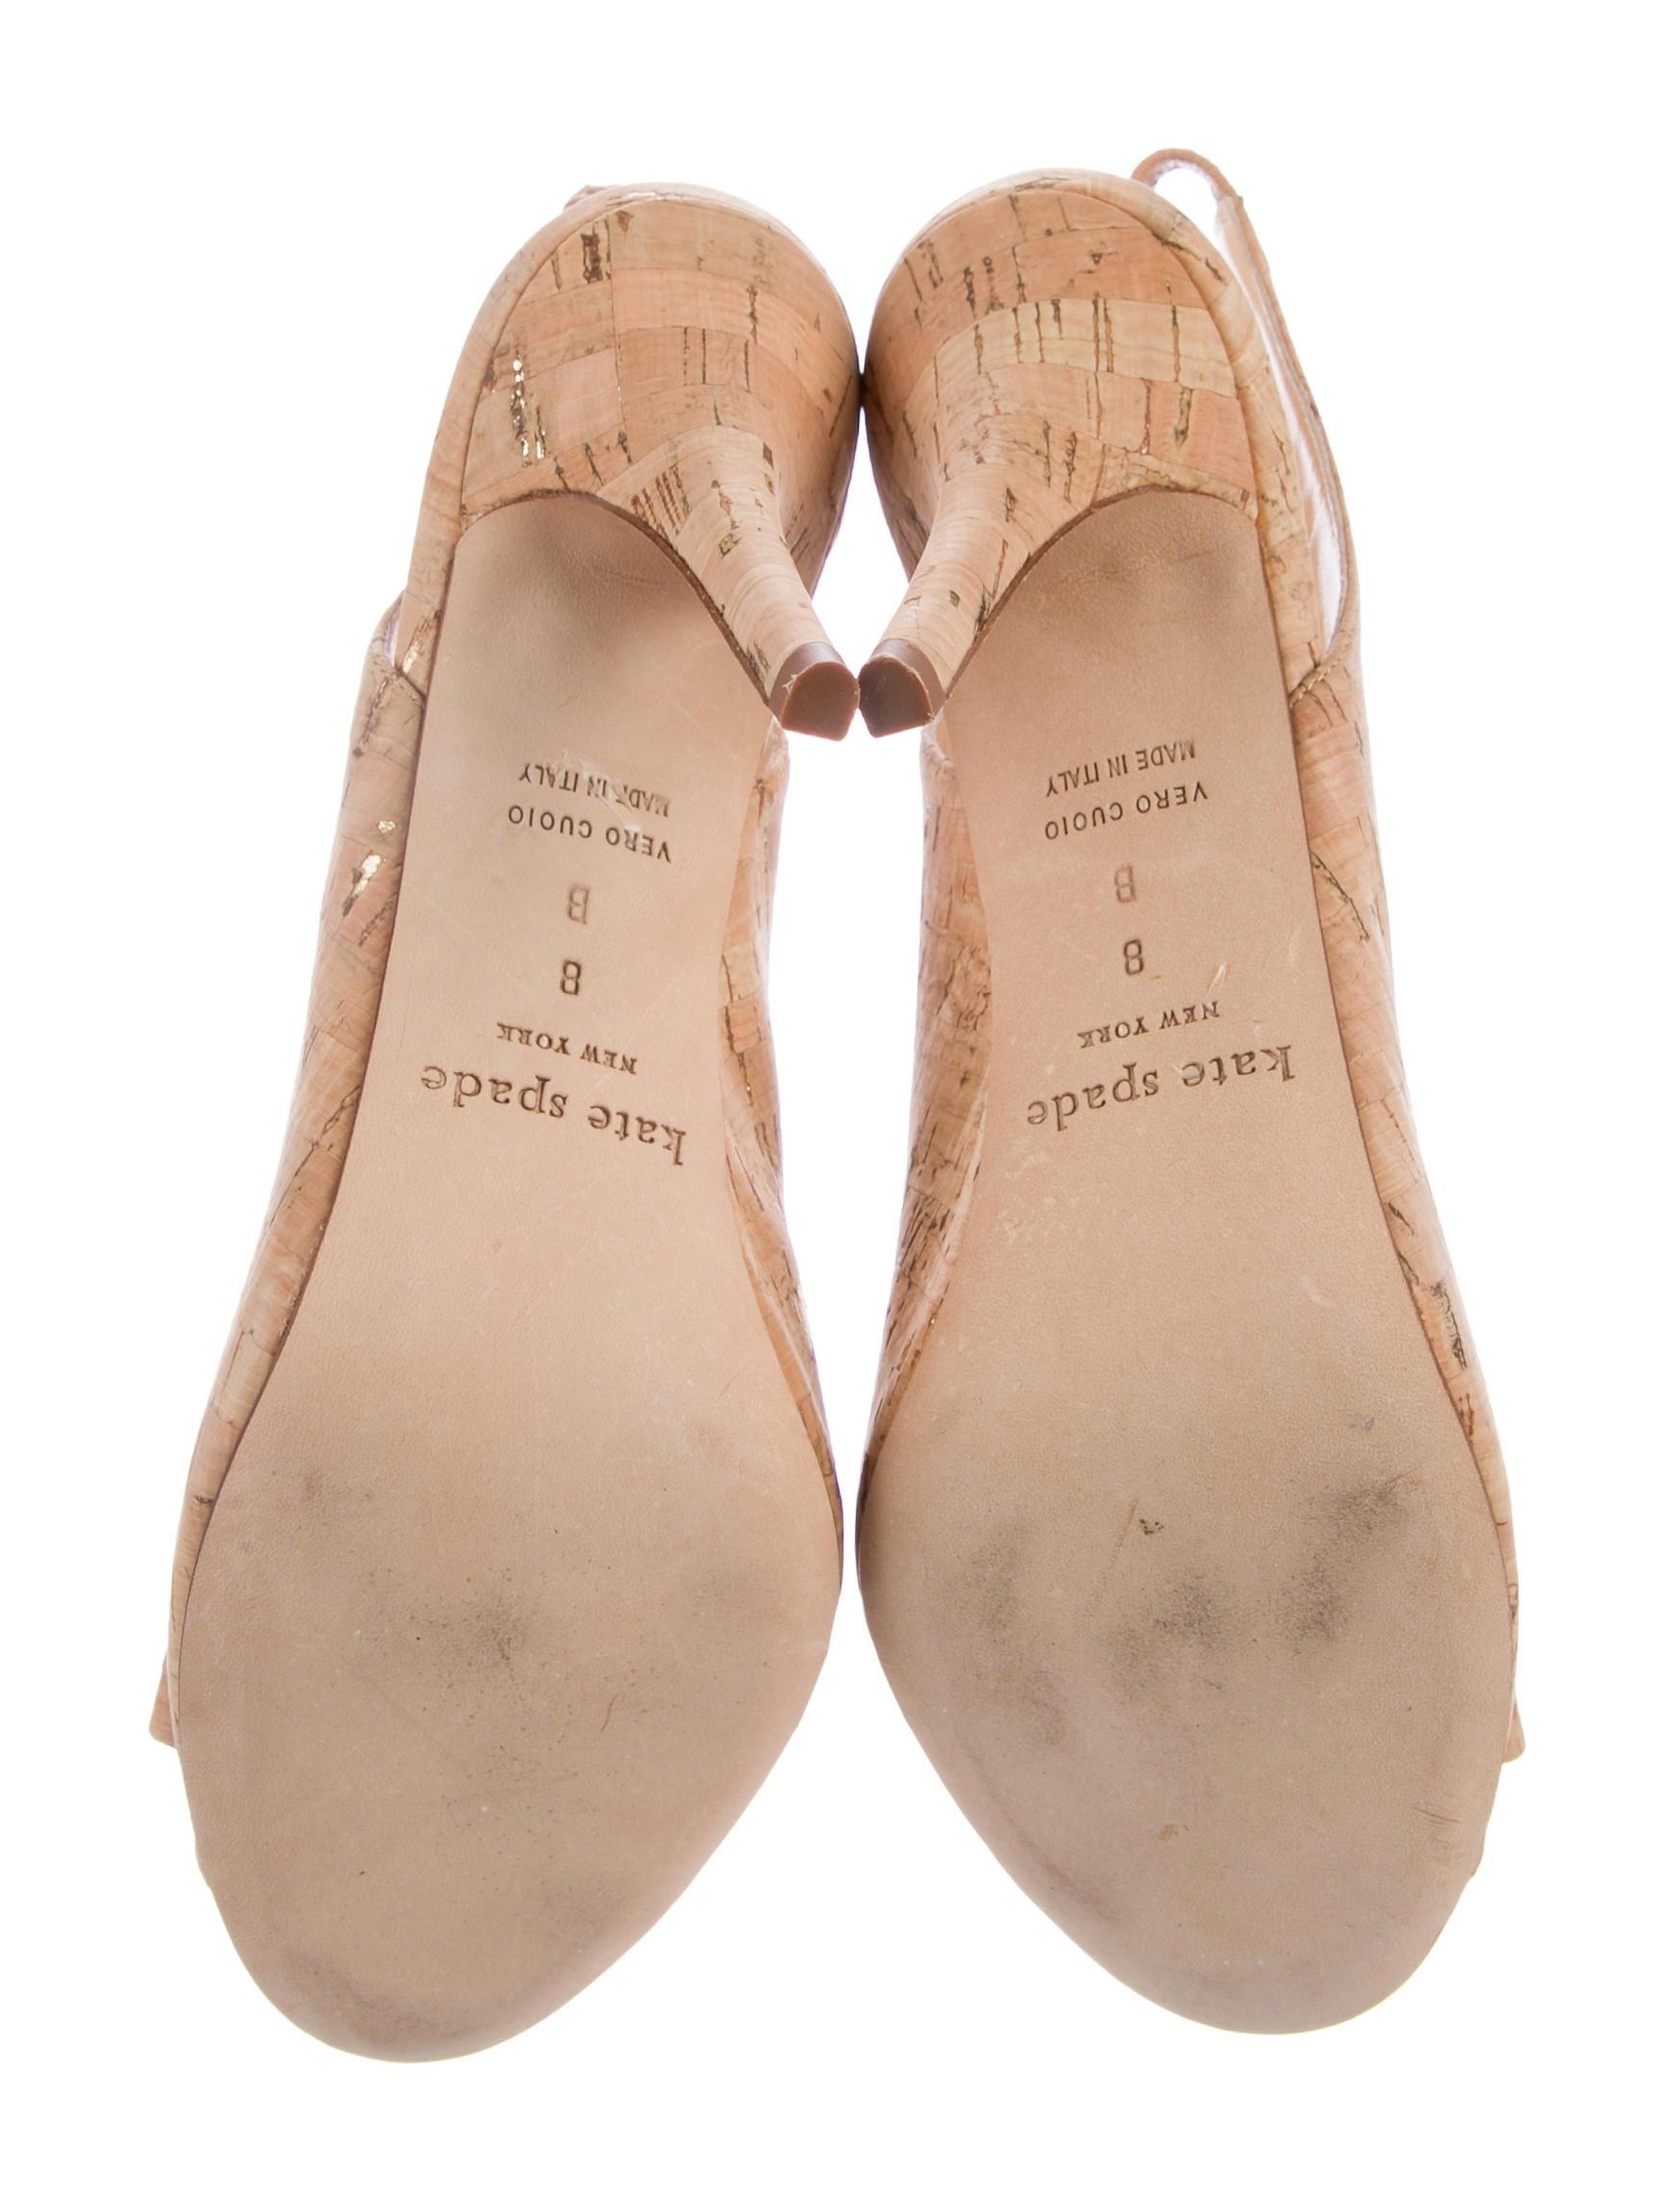 03a5172049c4 Kate Spade New York Cork Slingback Pumps - Shoes - WKA68684